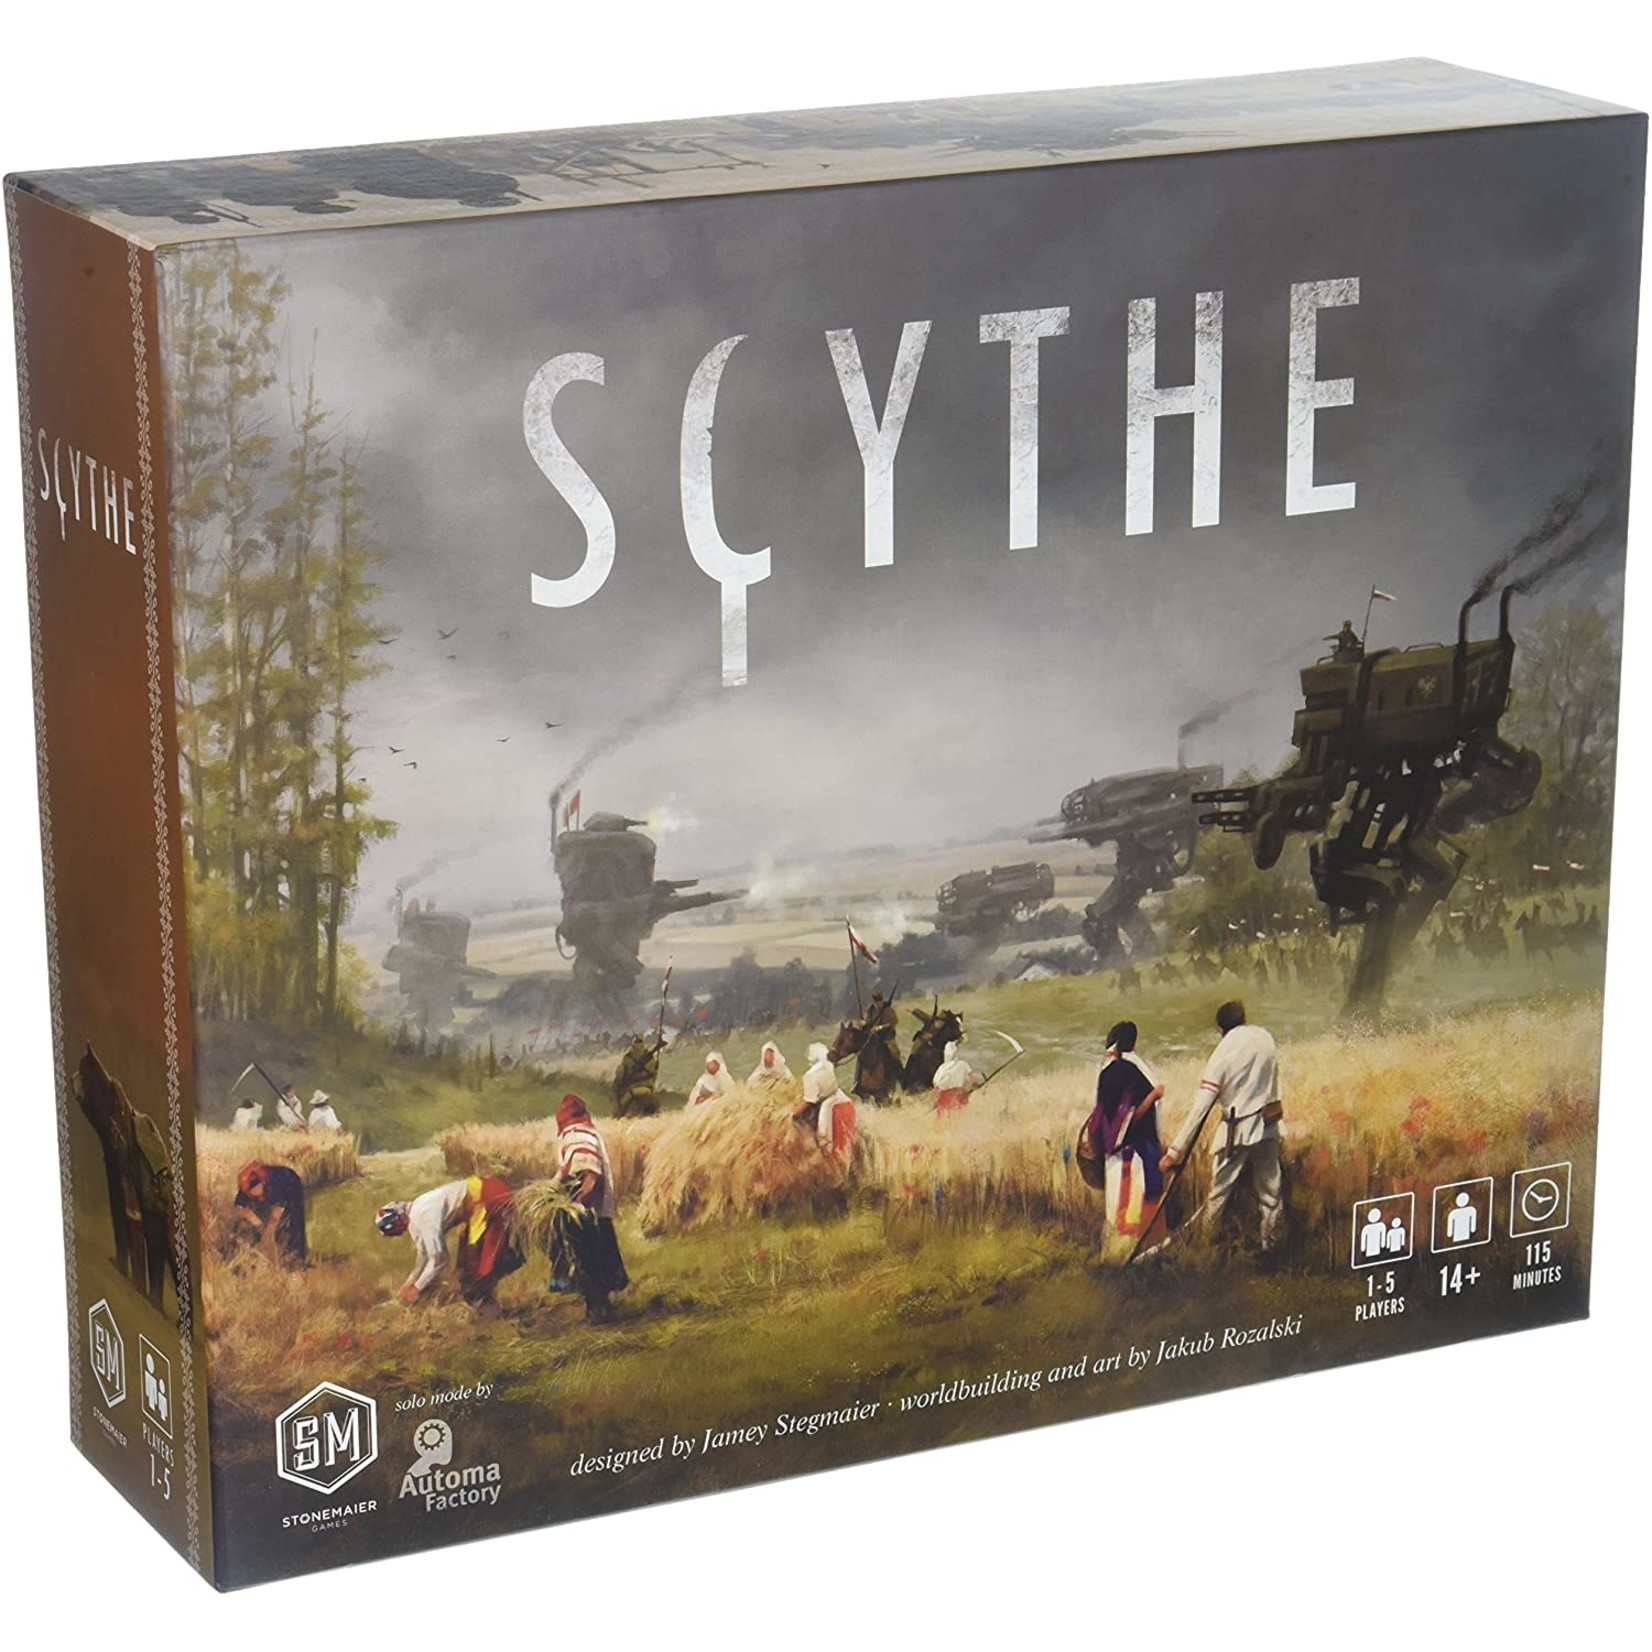 Greater Than Games Scythe